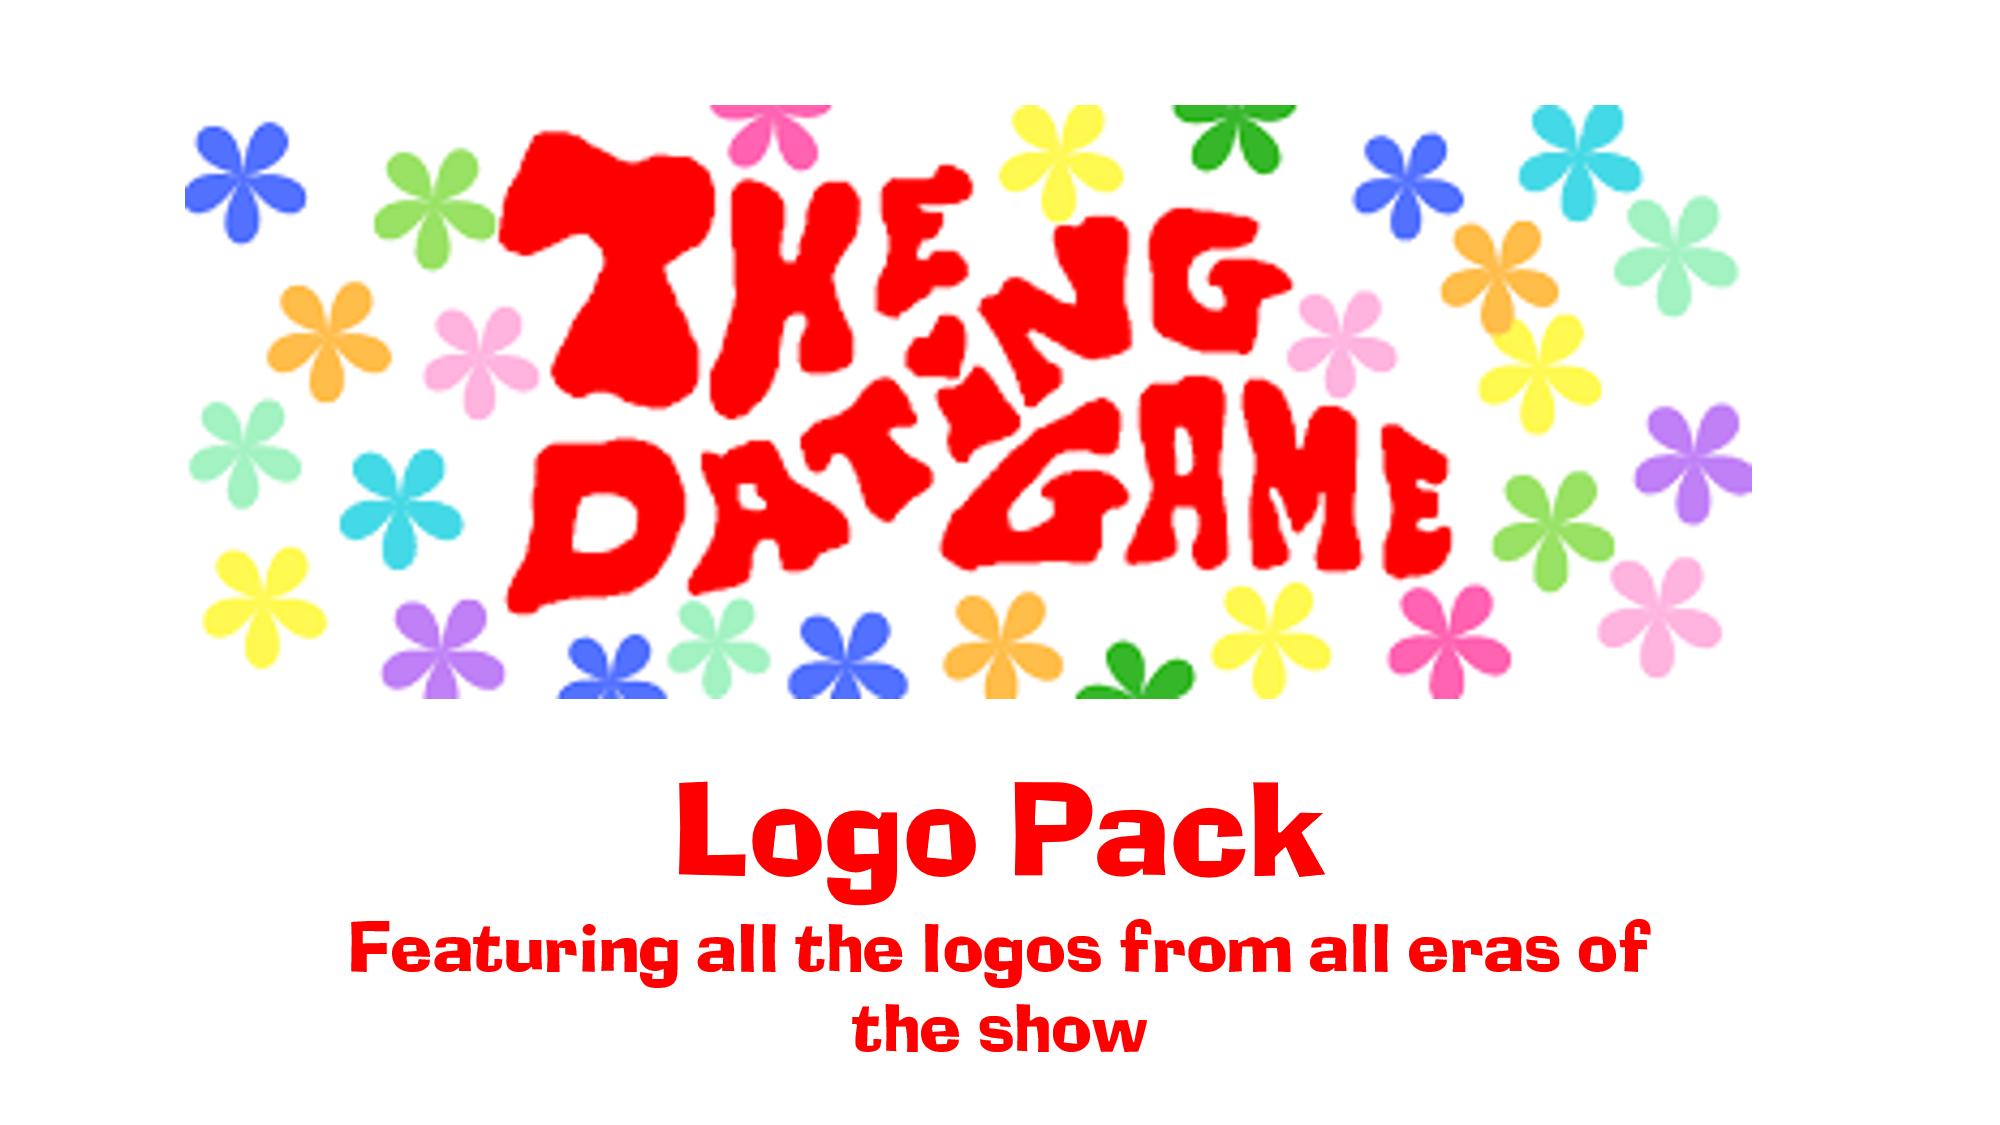 Dating game logo black people dating sites